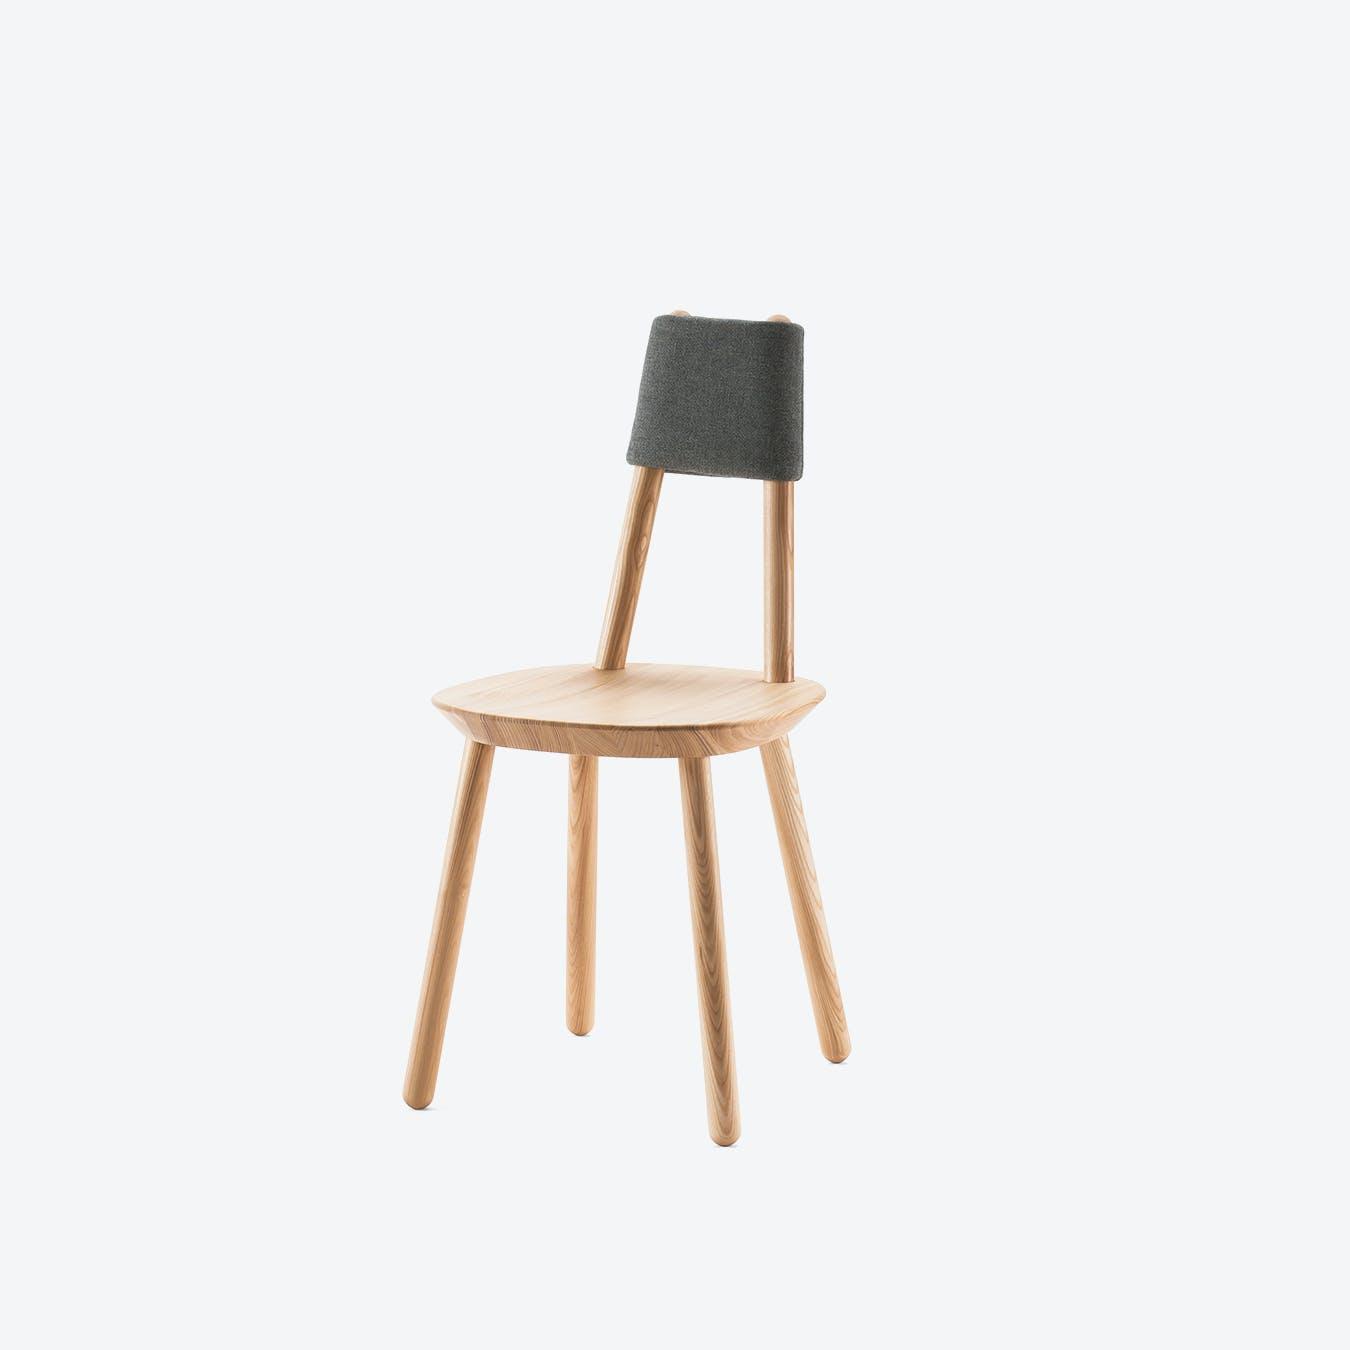 Naïve Chair in Natural Ash